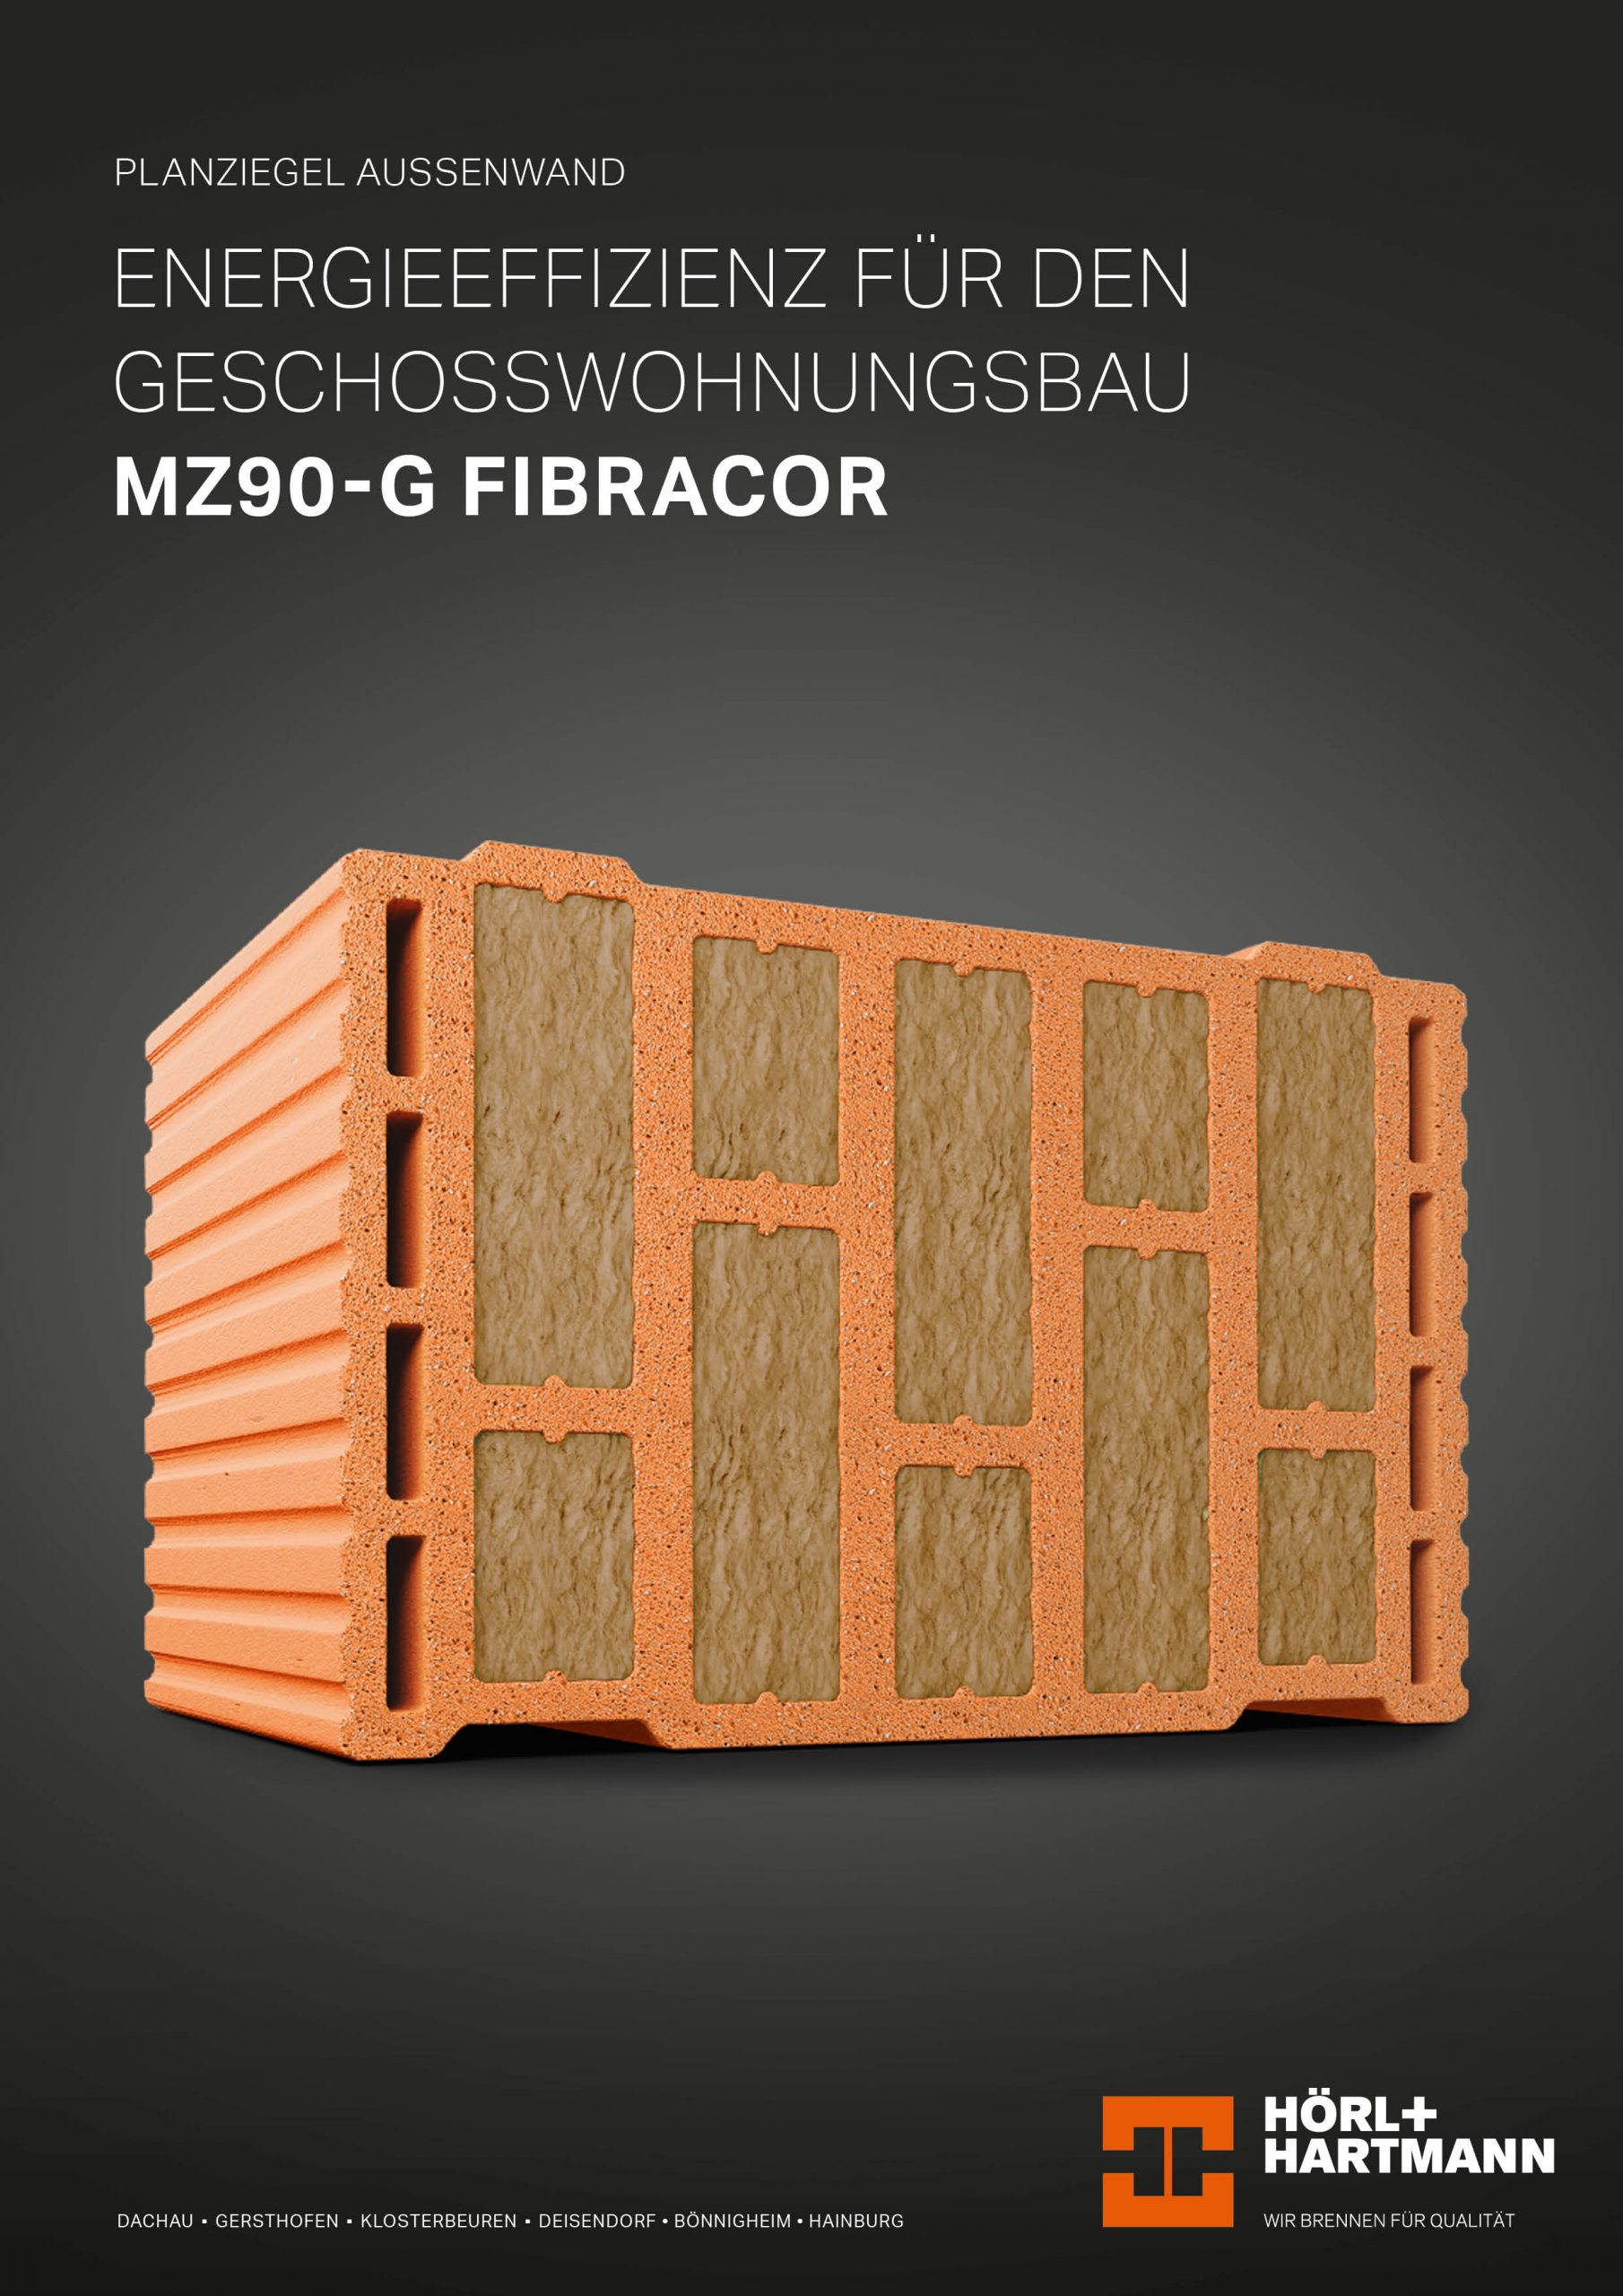 Datenblatt MZ90-G FIBRACOR